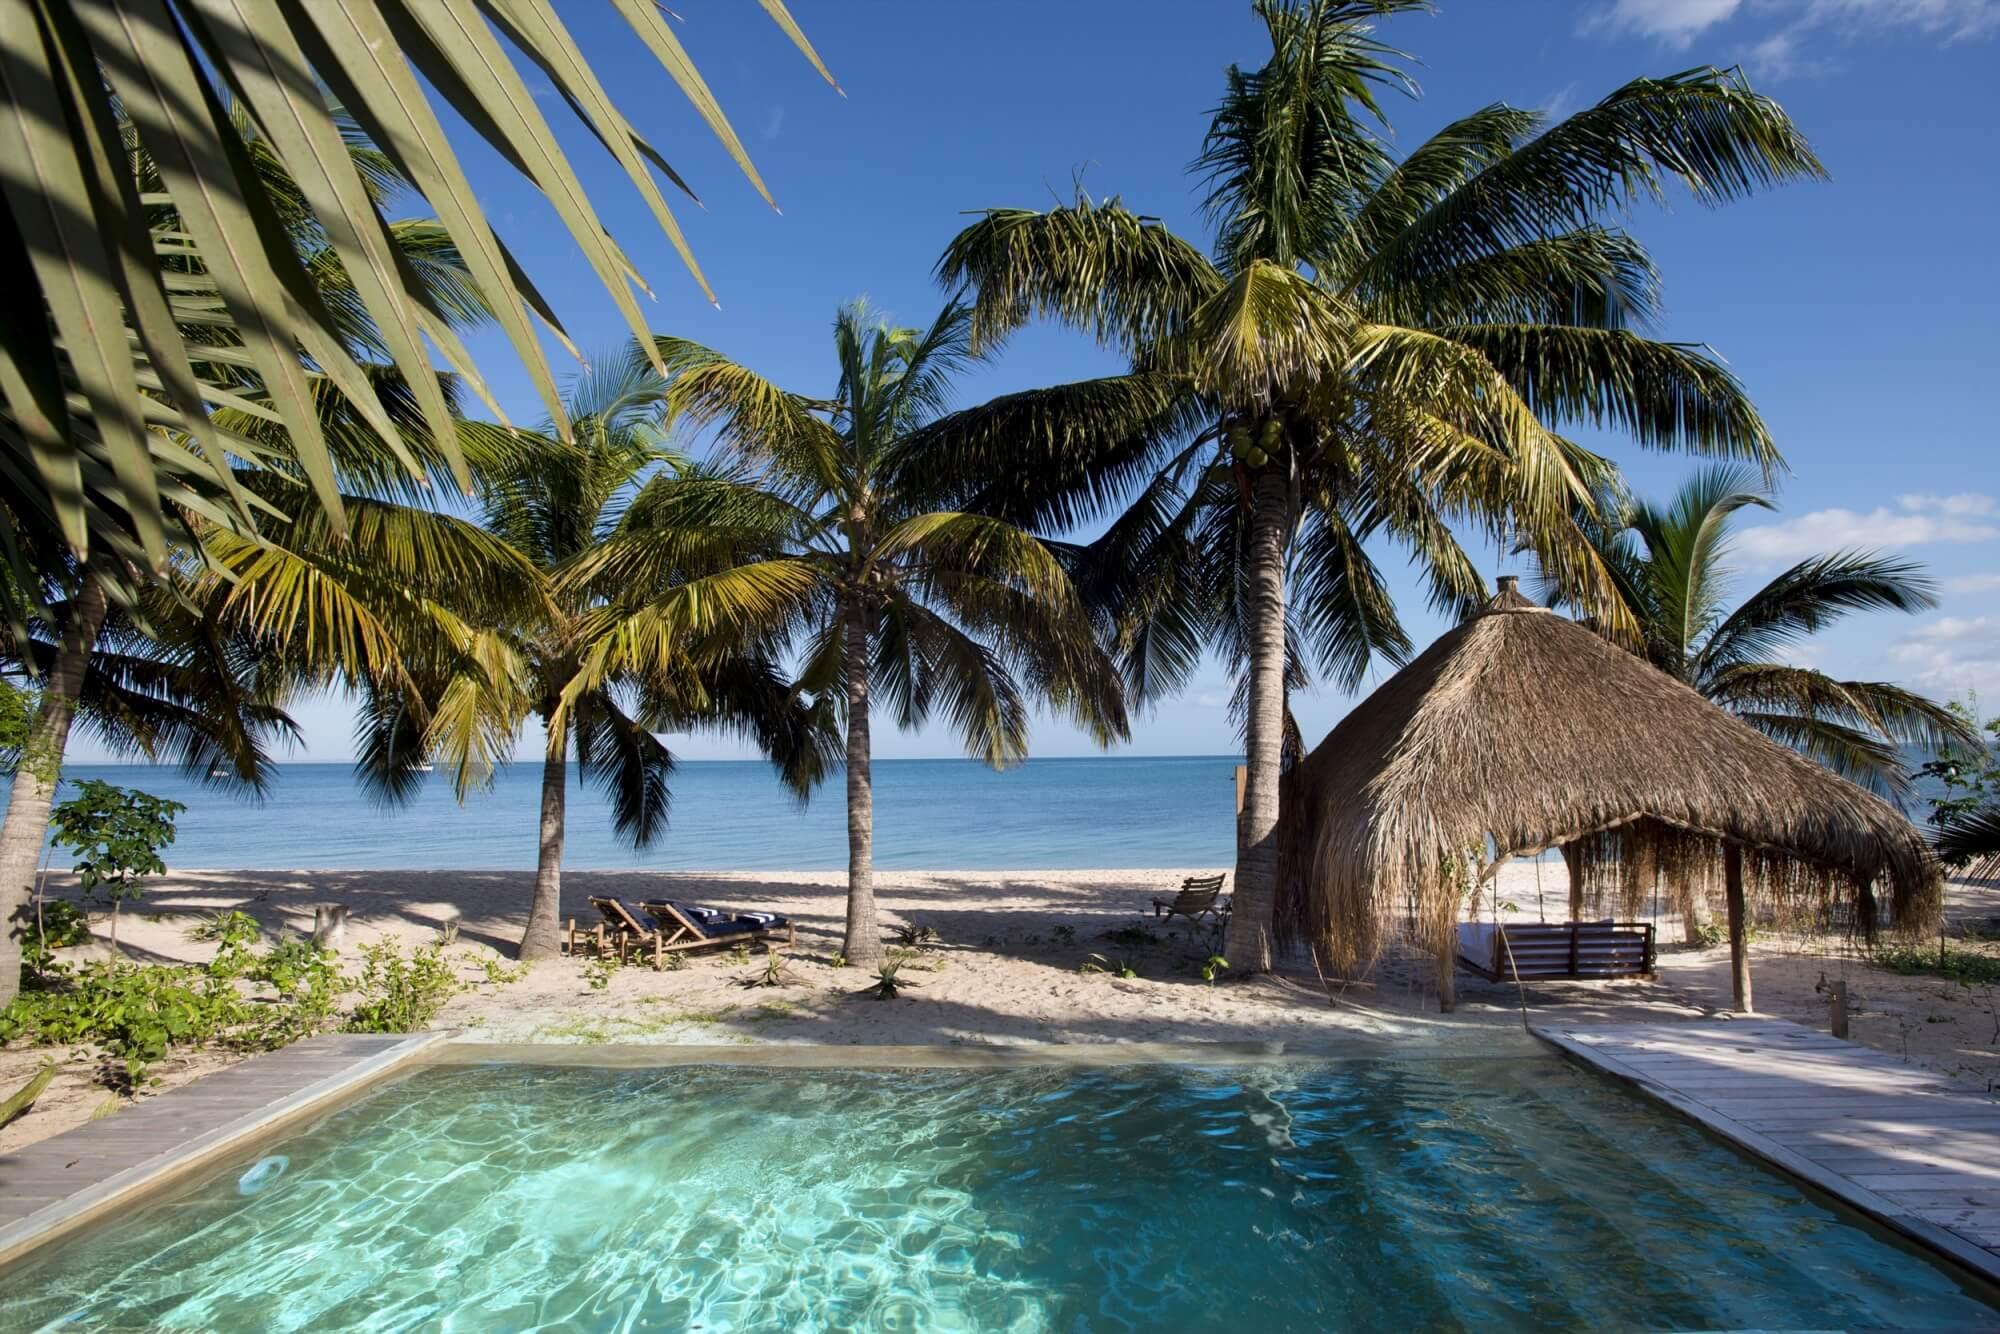 Benguerra-Island-Private-Pool-3.jpg